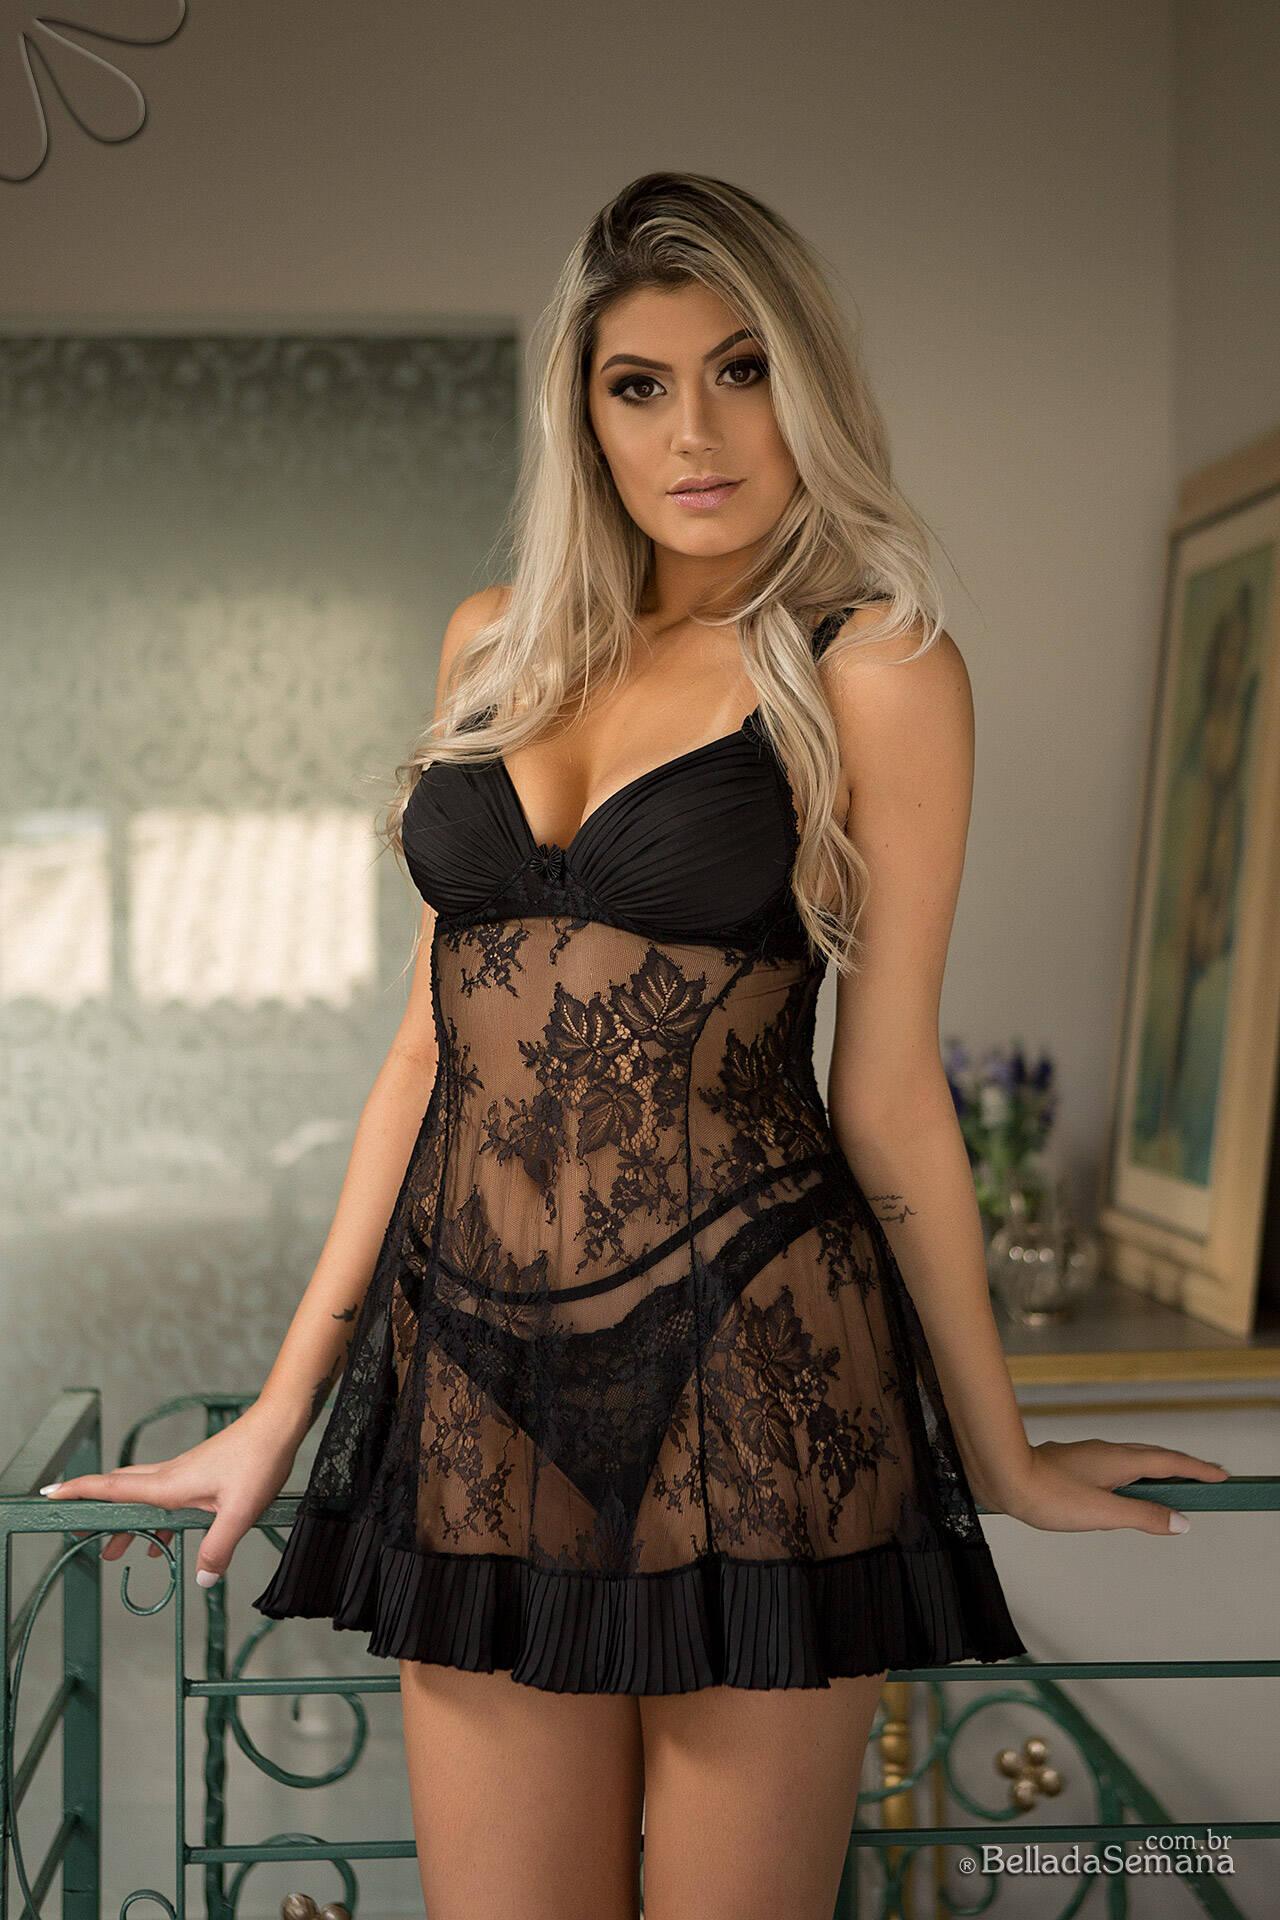 Fernanda Cardoso em ensaio sensual para a revista masculina Bella da Semana. Foto: Vini Marques